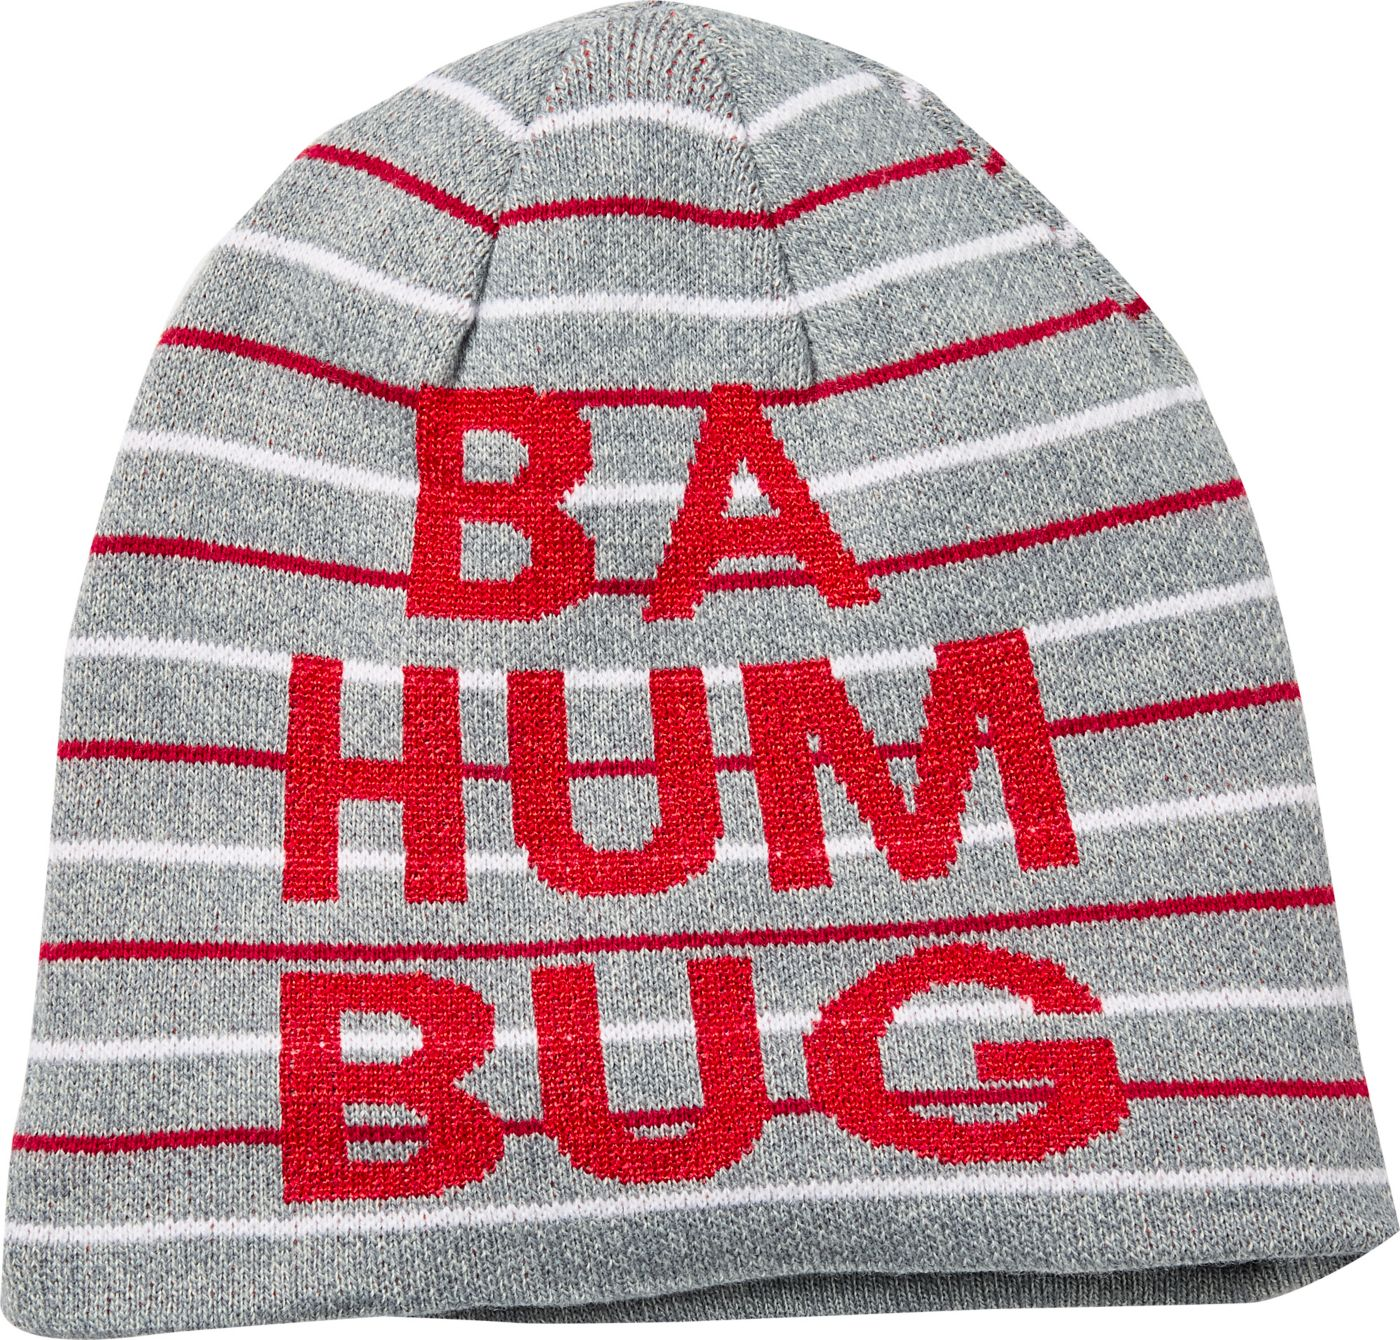 Field & Stream Humbug Beanie